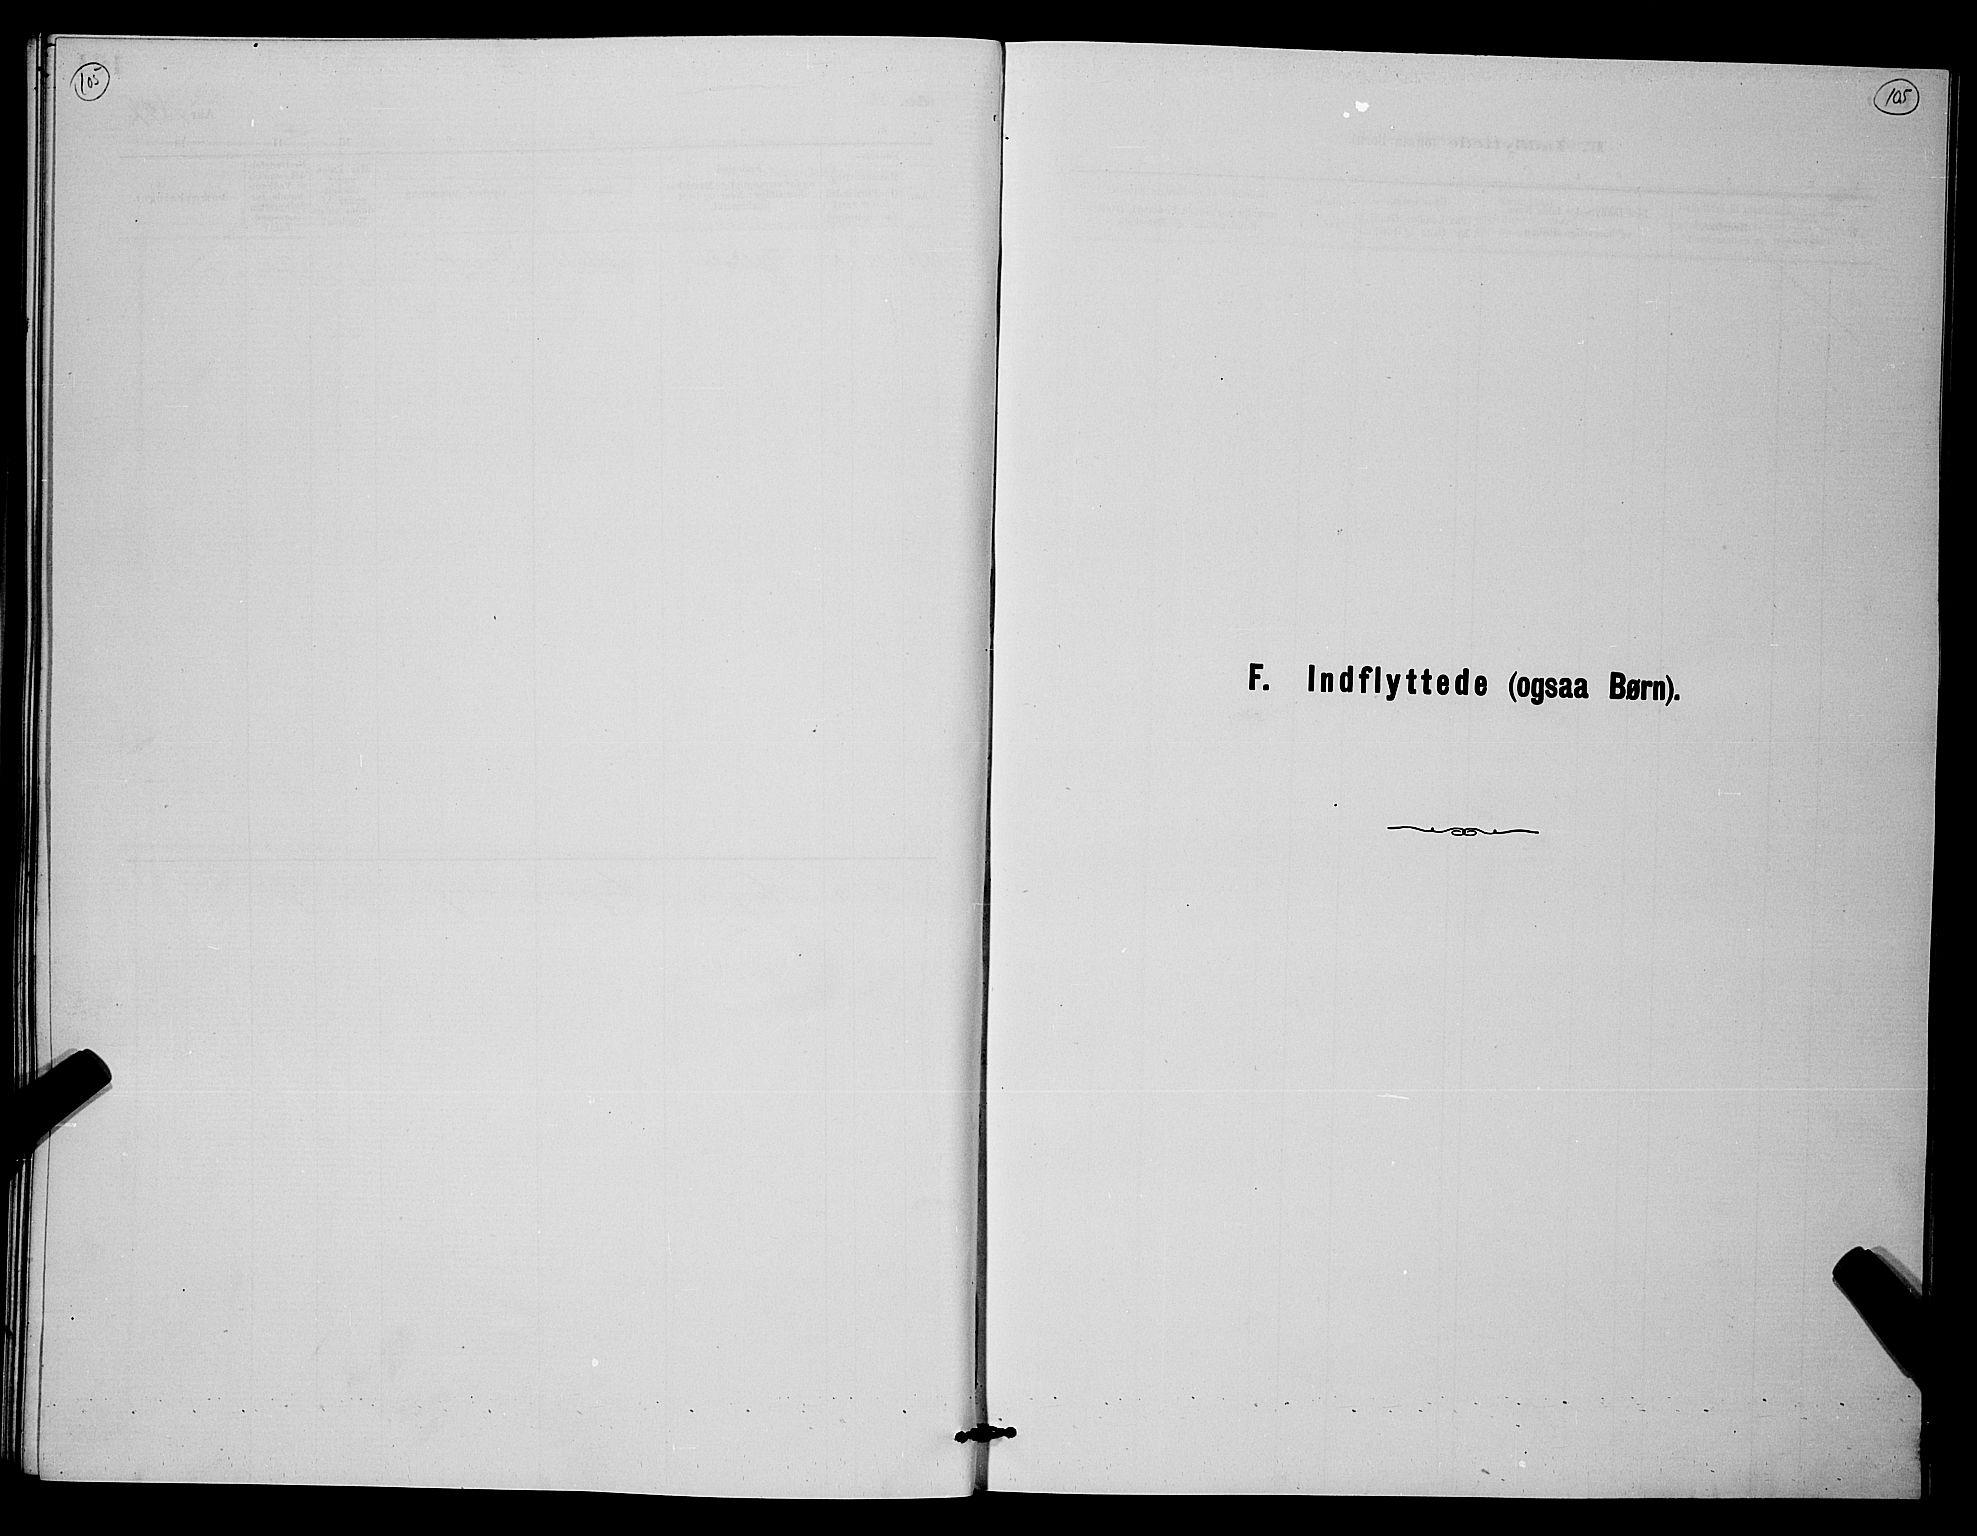 SAKO, Holla kirkebøker, G/Gb/L0001: Klokkerbok nr. II 1, 1882-1897, s. 105